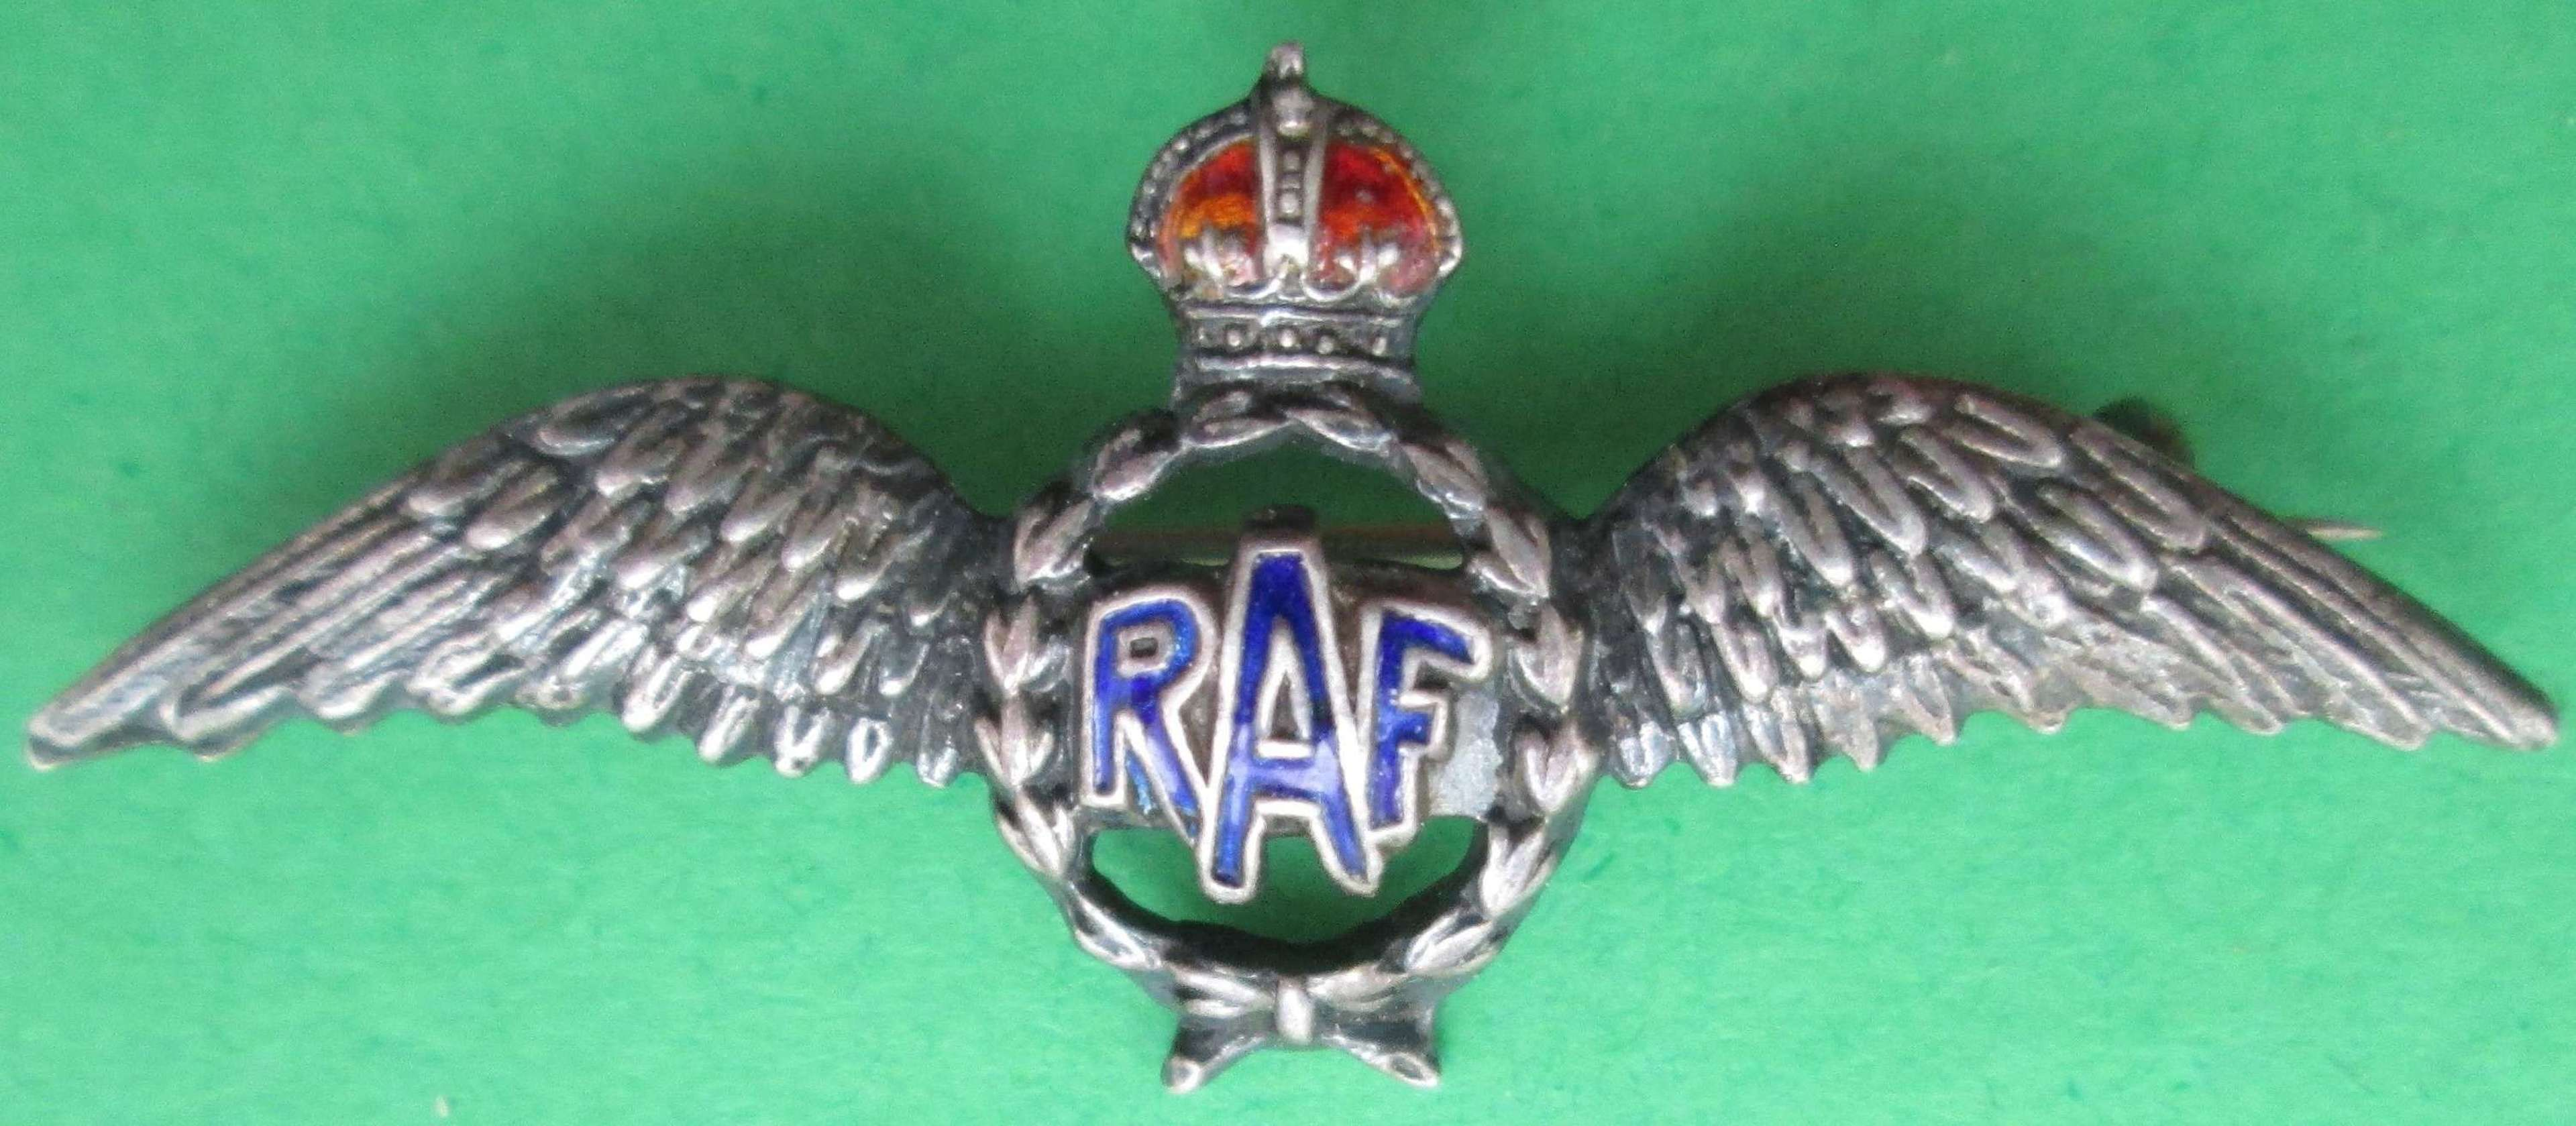 AN RAF STERLING SILVER SWEETHEART BROOCH